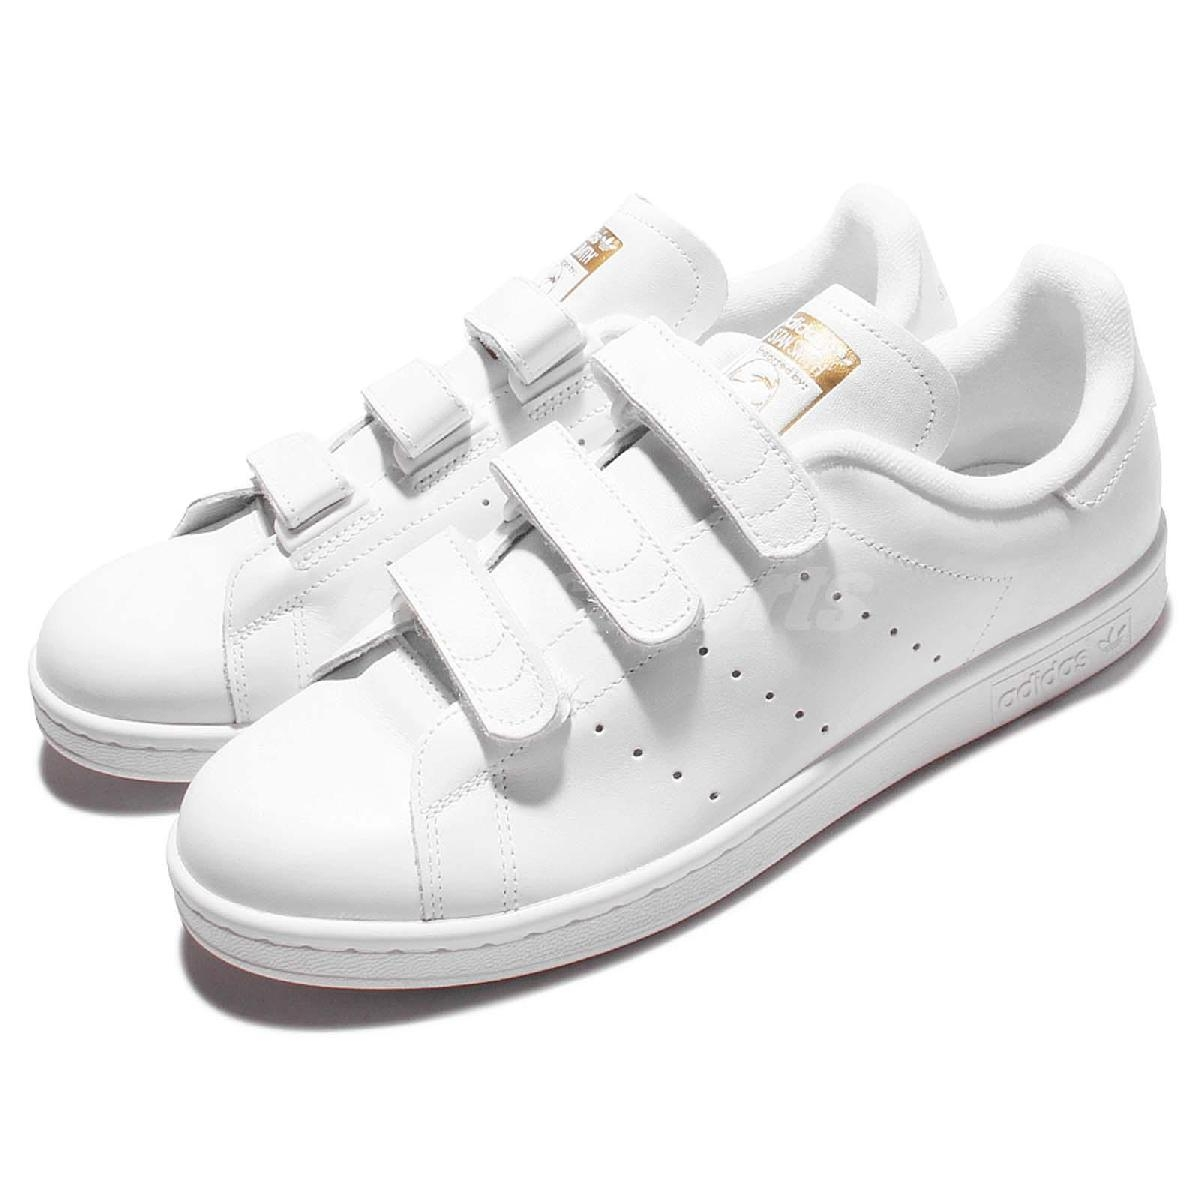 adidas休閒鞋Stan Smith CF白金魔鬼氈基本款百搭款男鞋女鞋PUMP306 S75188